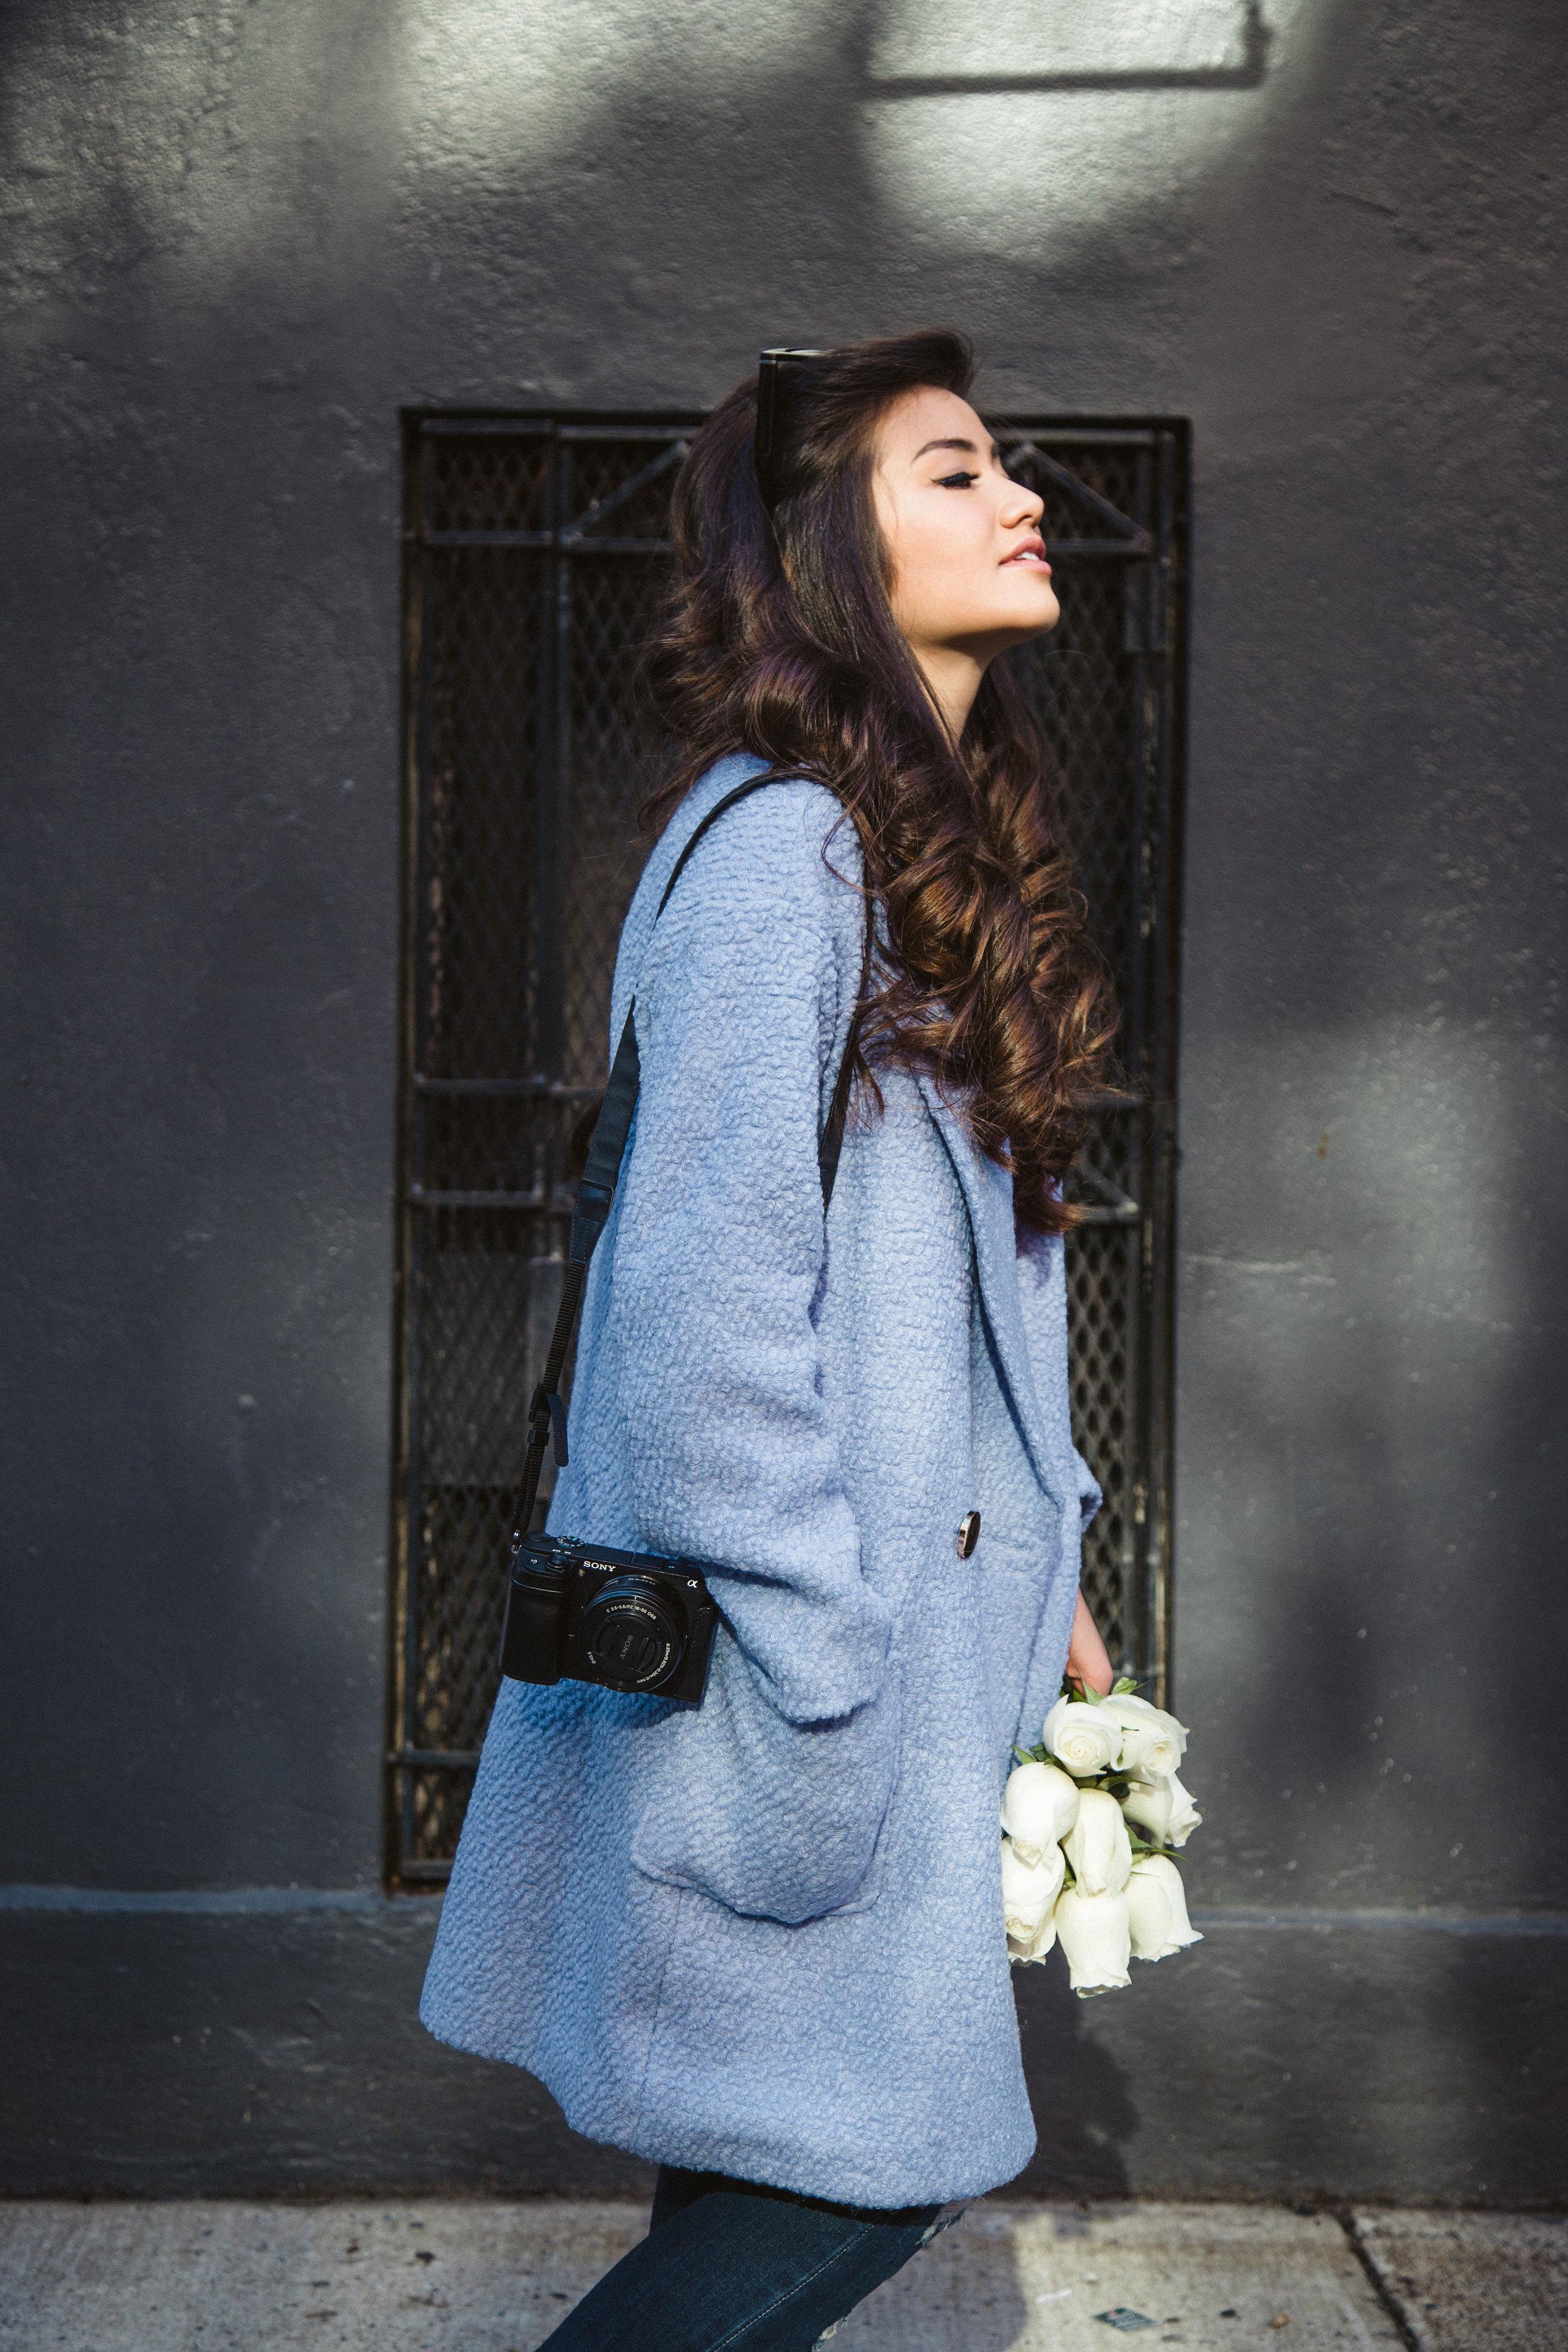 Caila Quinn Lavender Coat